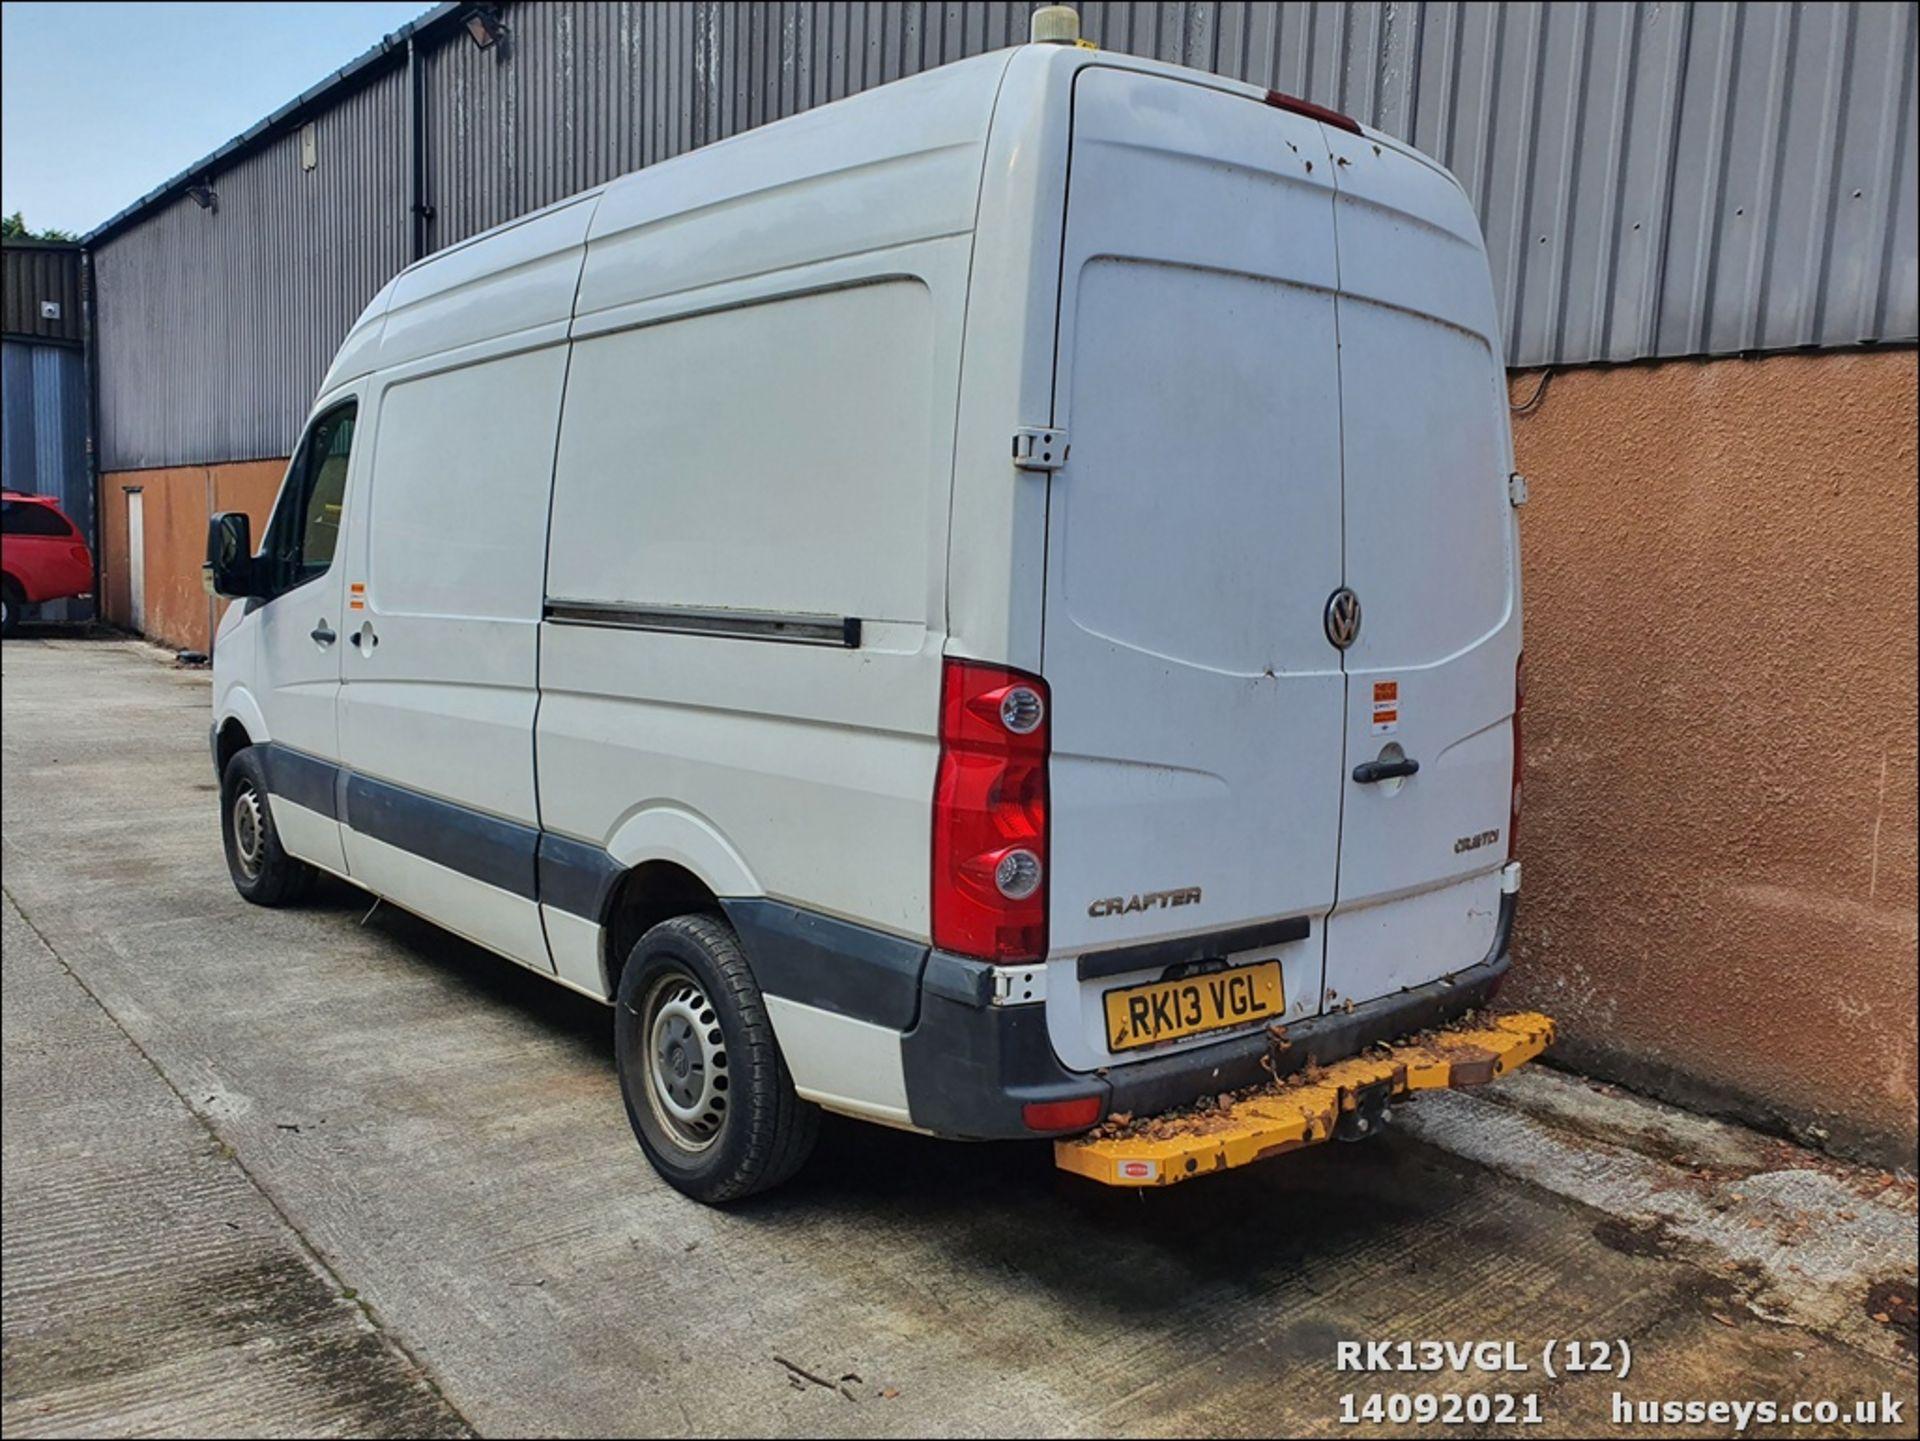 13/13 VOLKSWAGEN CRAFTER CR35 TDI 143 MWB - 1968cc 5dr Van (White, 75k) - Image 12 of 13